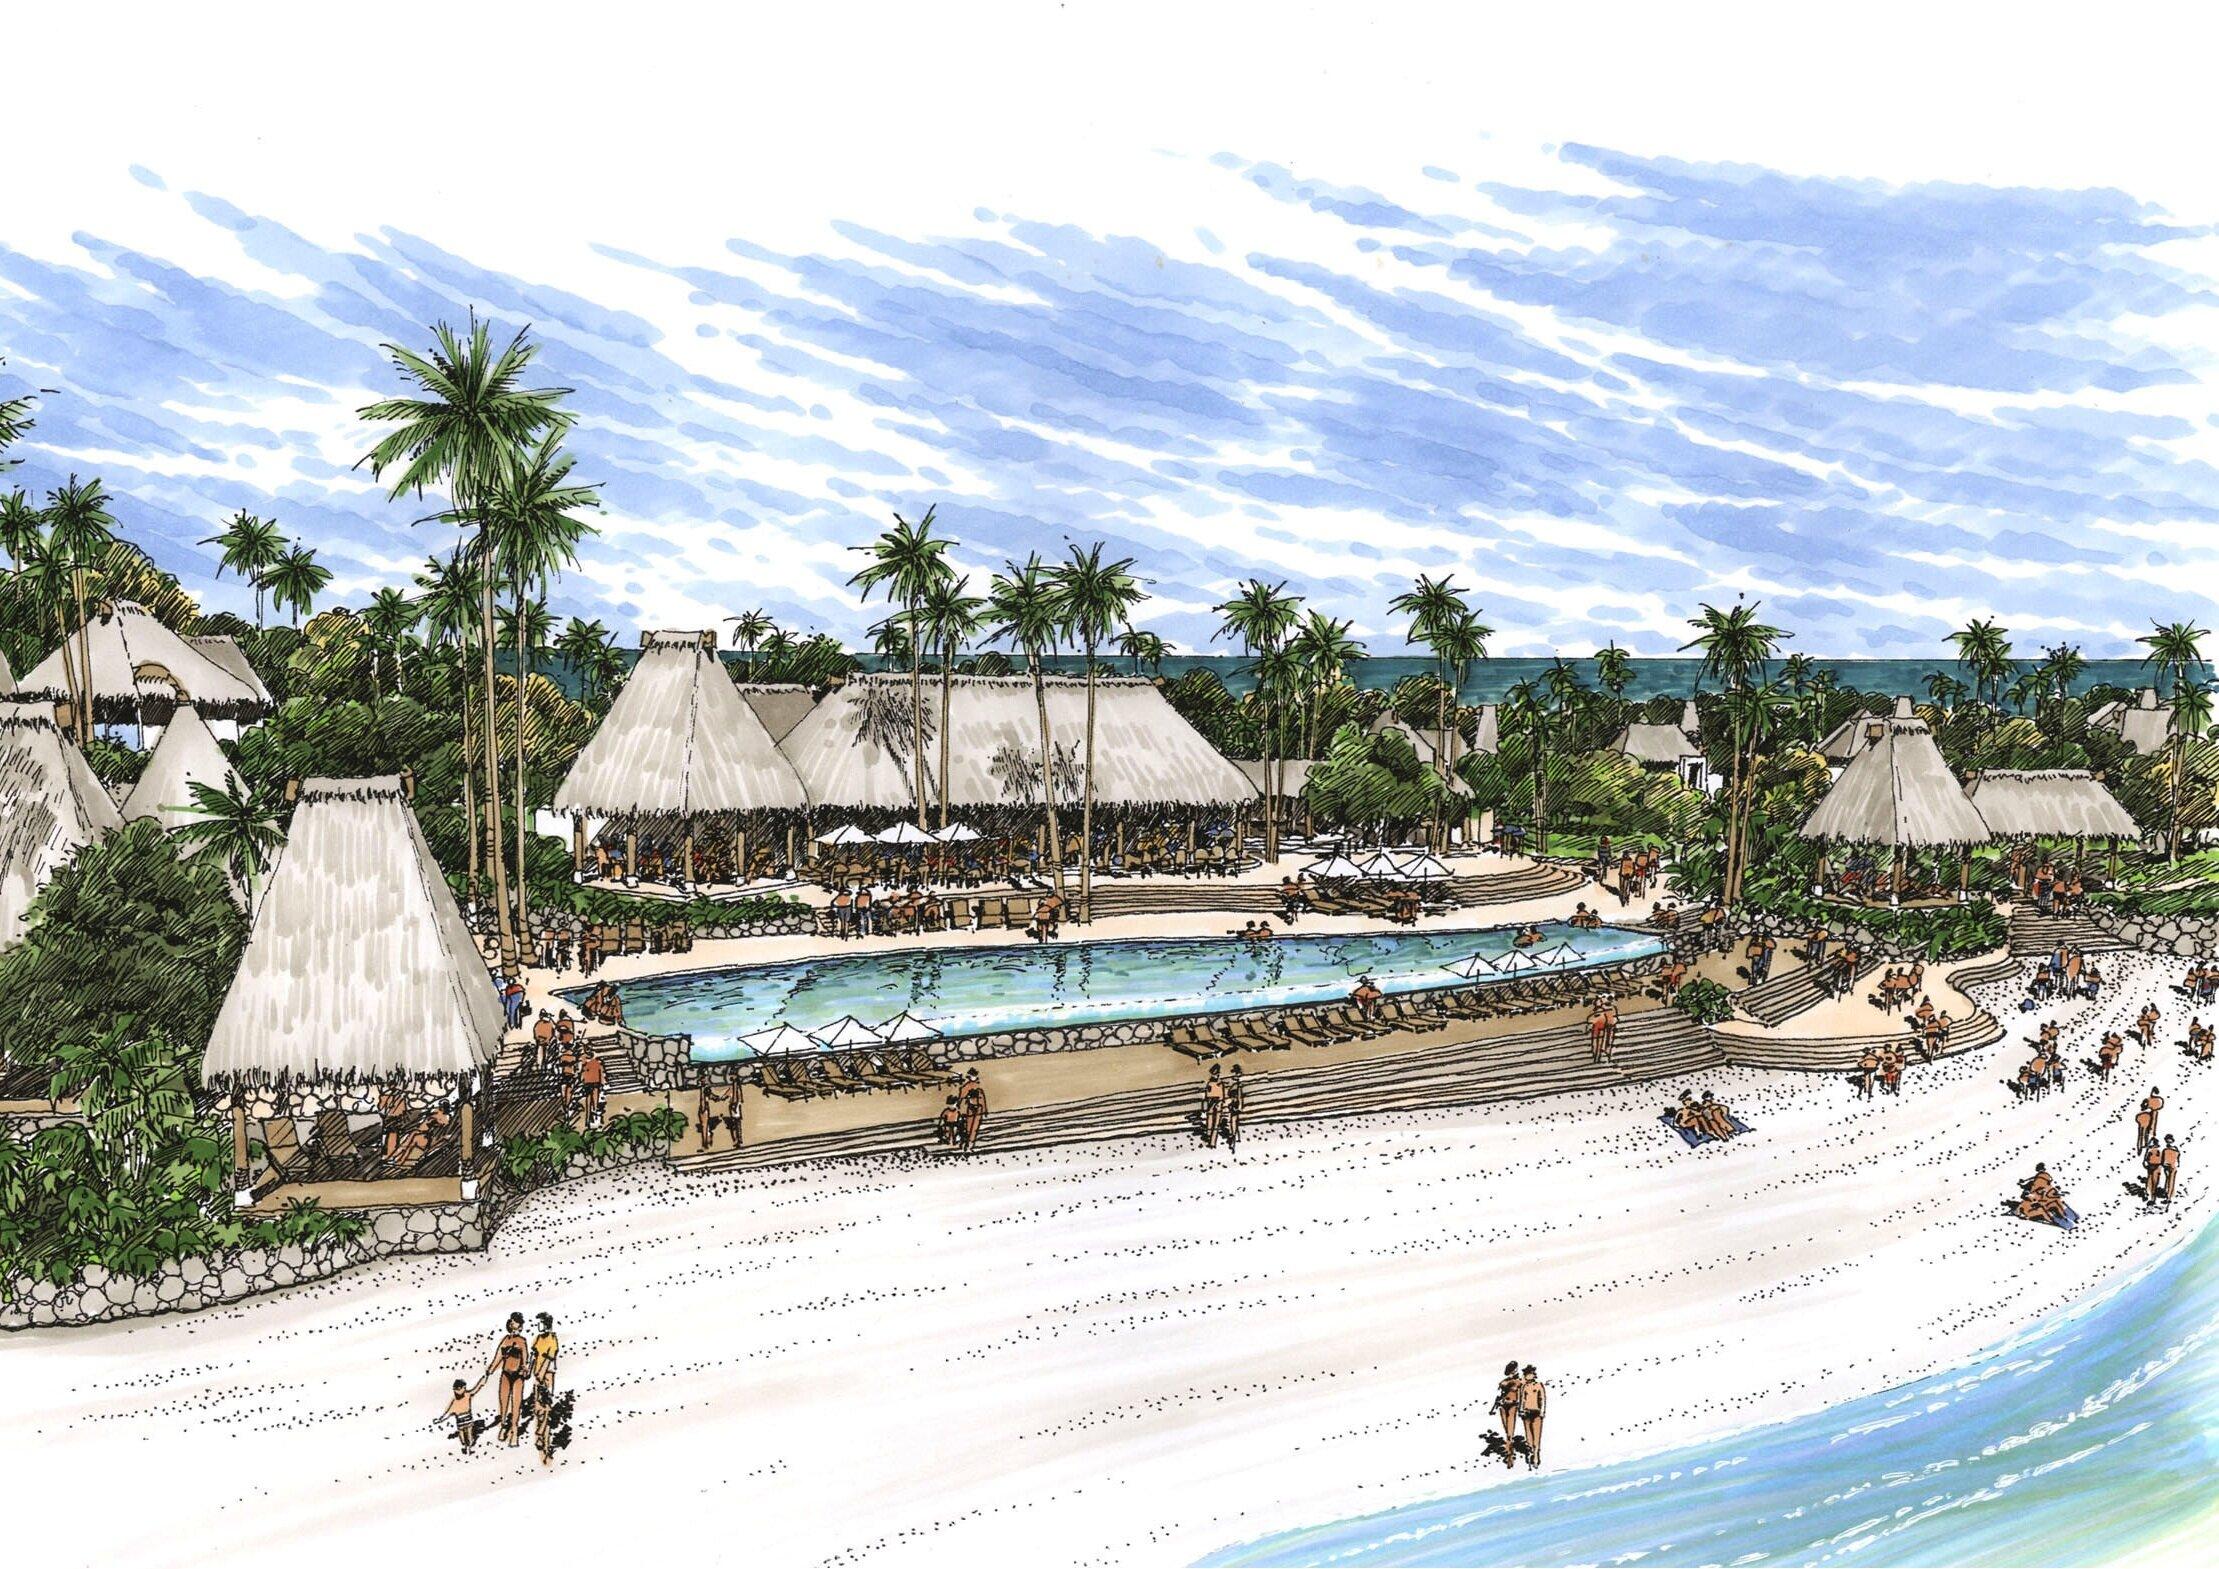 2007 - natadola marine resort